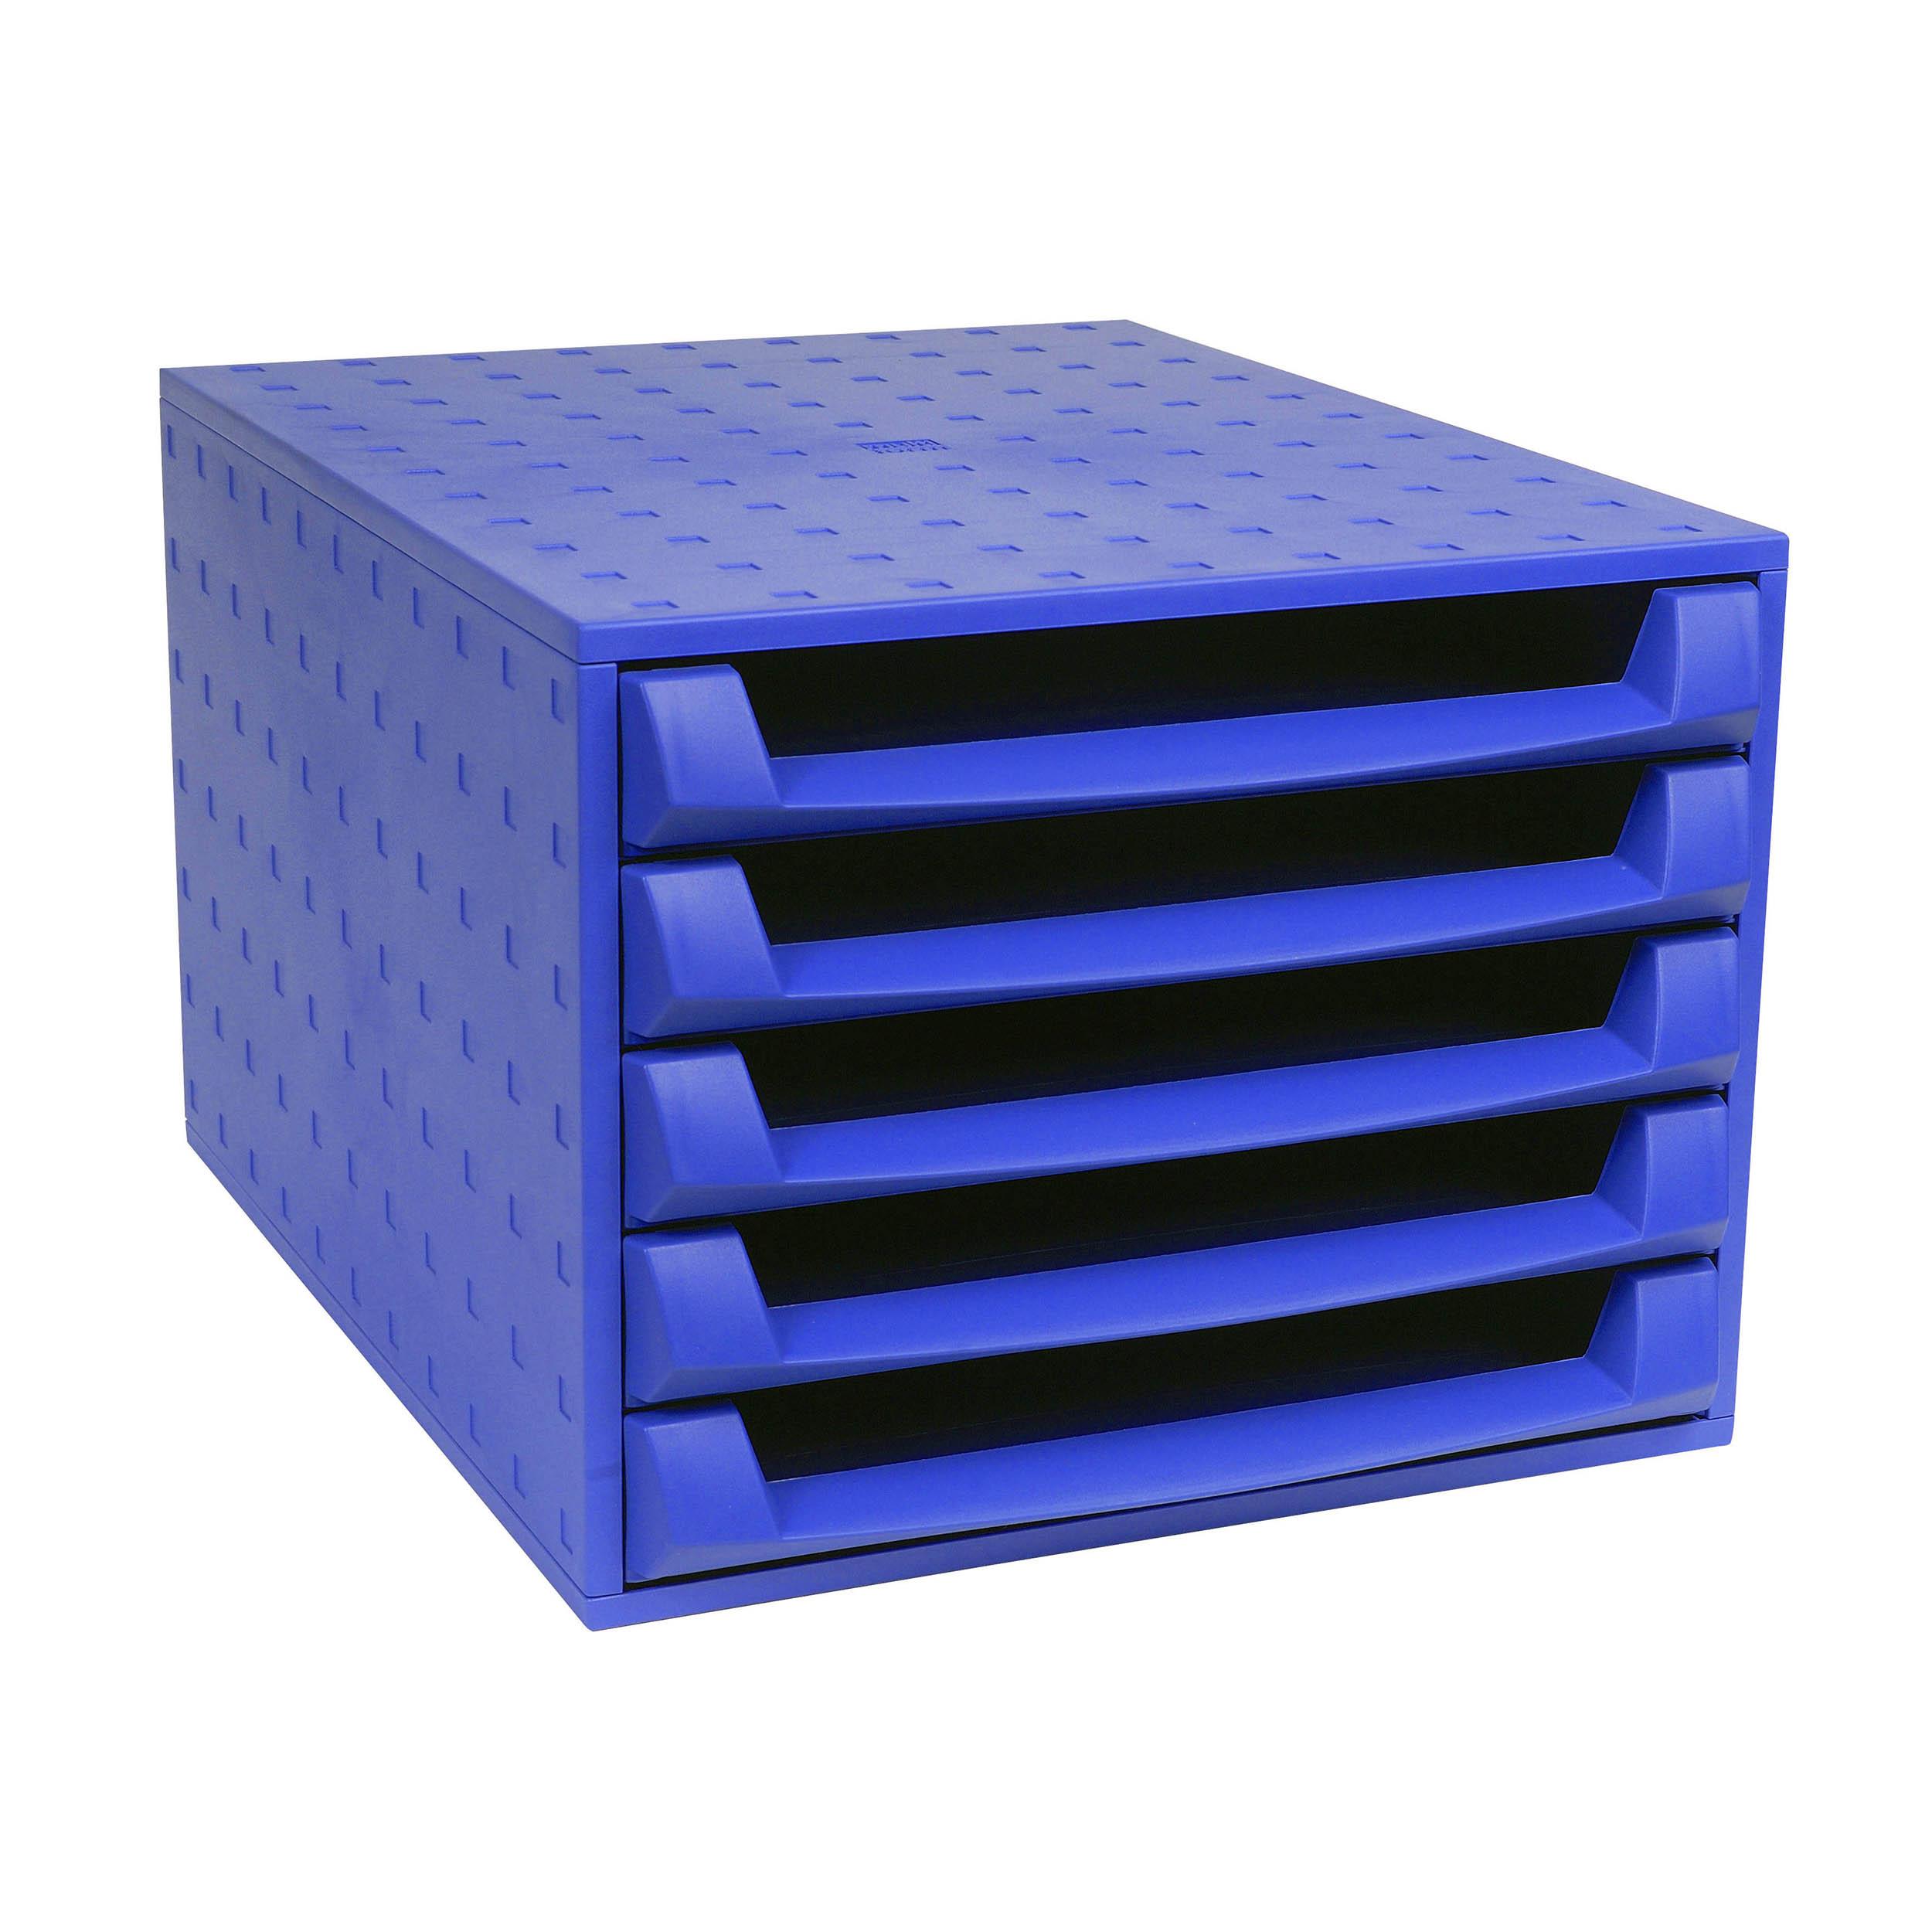 Exacompta Forever 5 Drawer Set Desktop Recycled Plastic W284xD387xH218mm Blue Ref 221101D